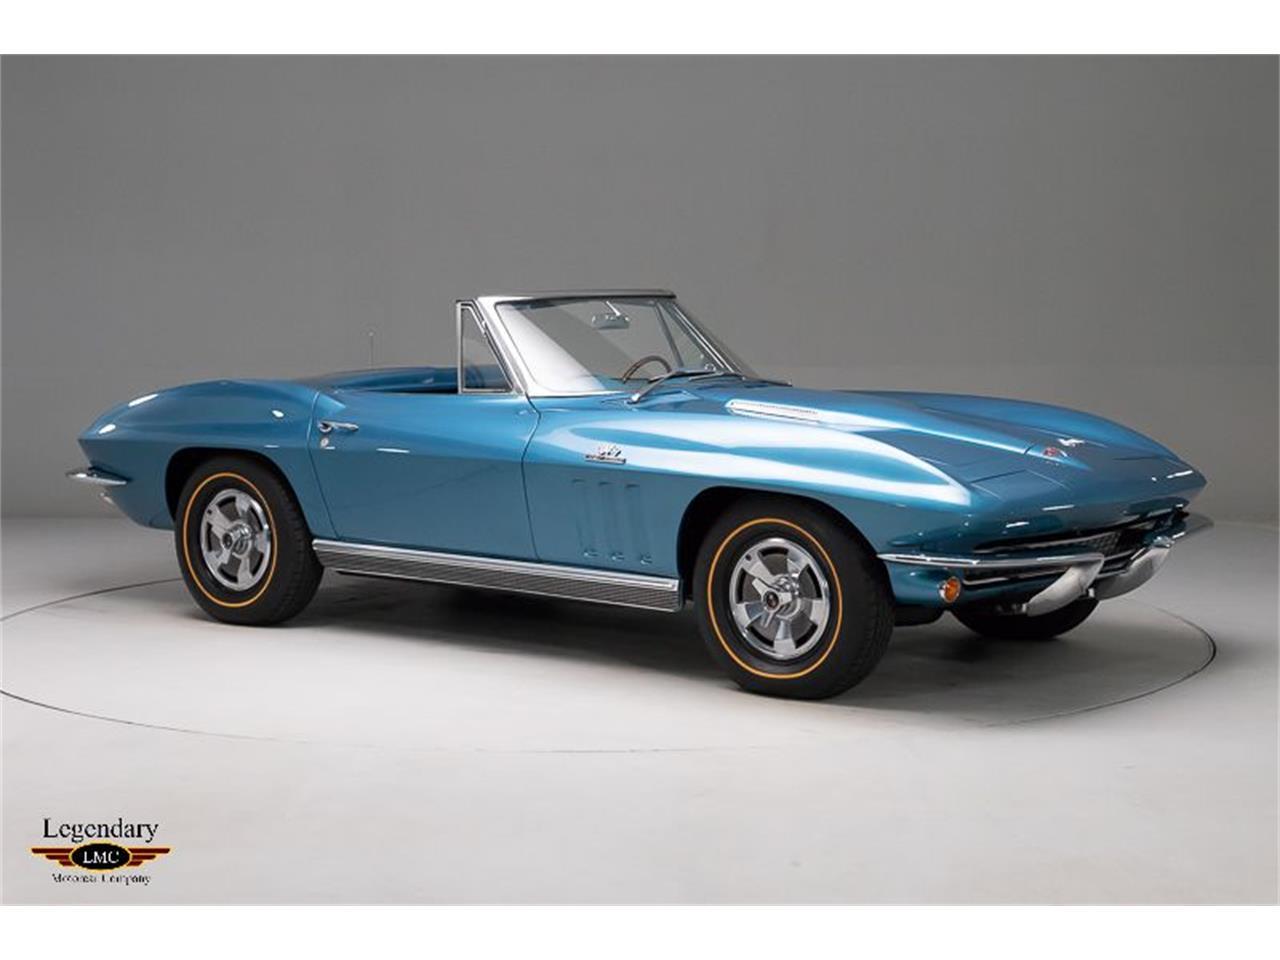 1966 Chevrolet Corvette (CC-1265848) for sale in Halton Hills, Ontario